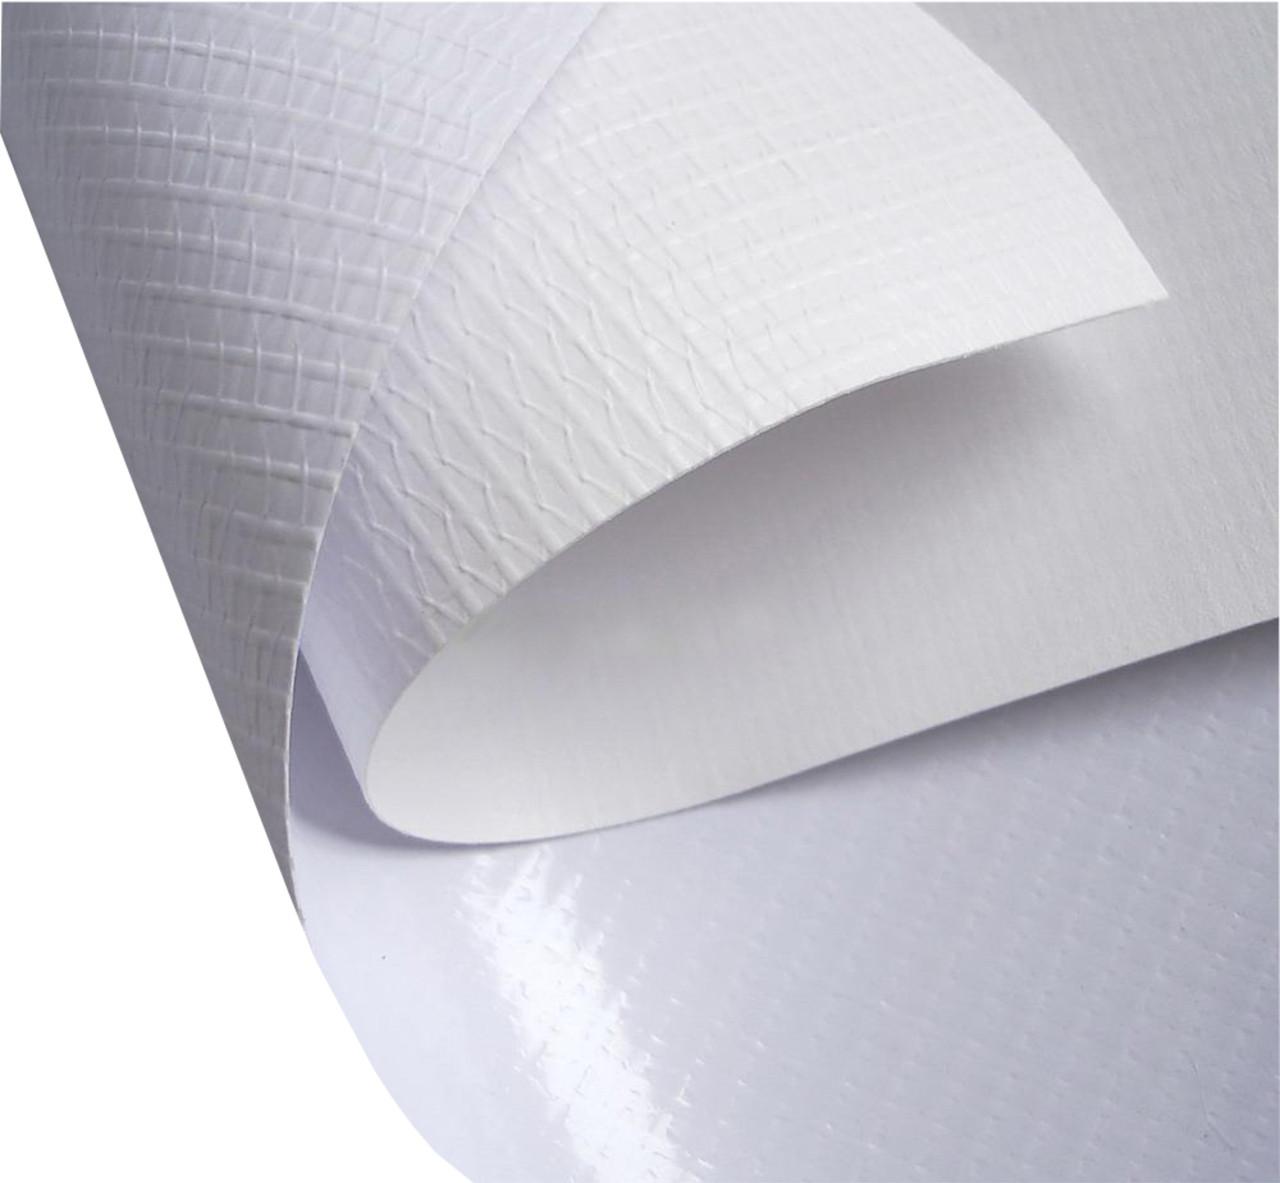 Баннер 440гр ГЛЯНЦЕВЫЙ плетение нитей 300*500 3.2мх50м